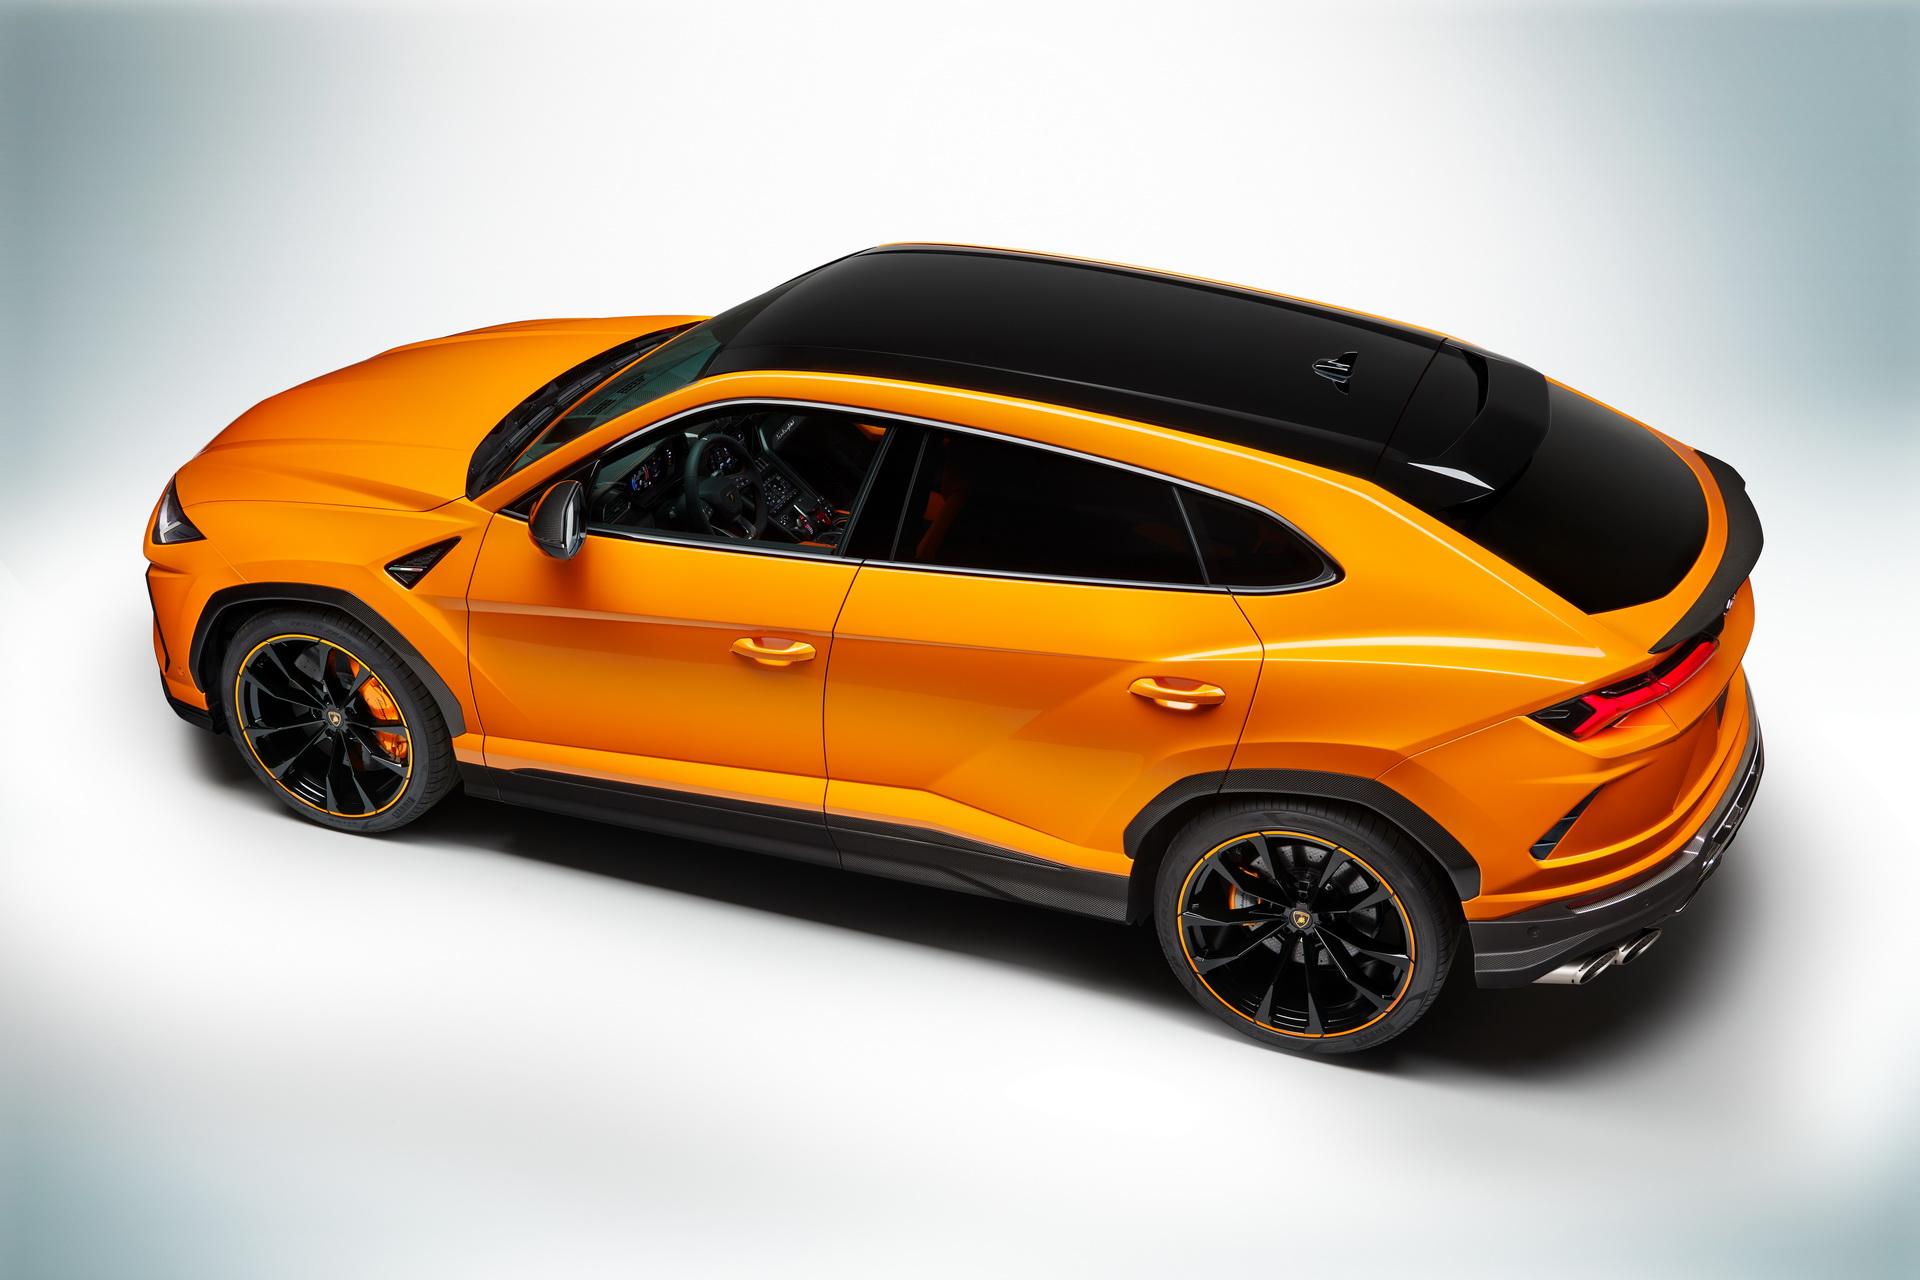 Lamborghini-Urus-Pearl-Capsule-Edition-12